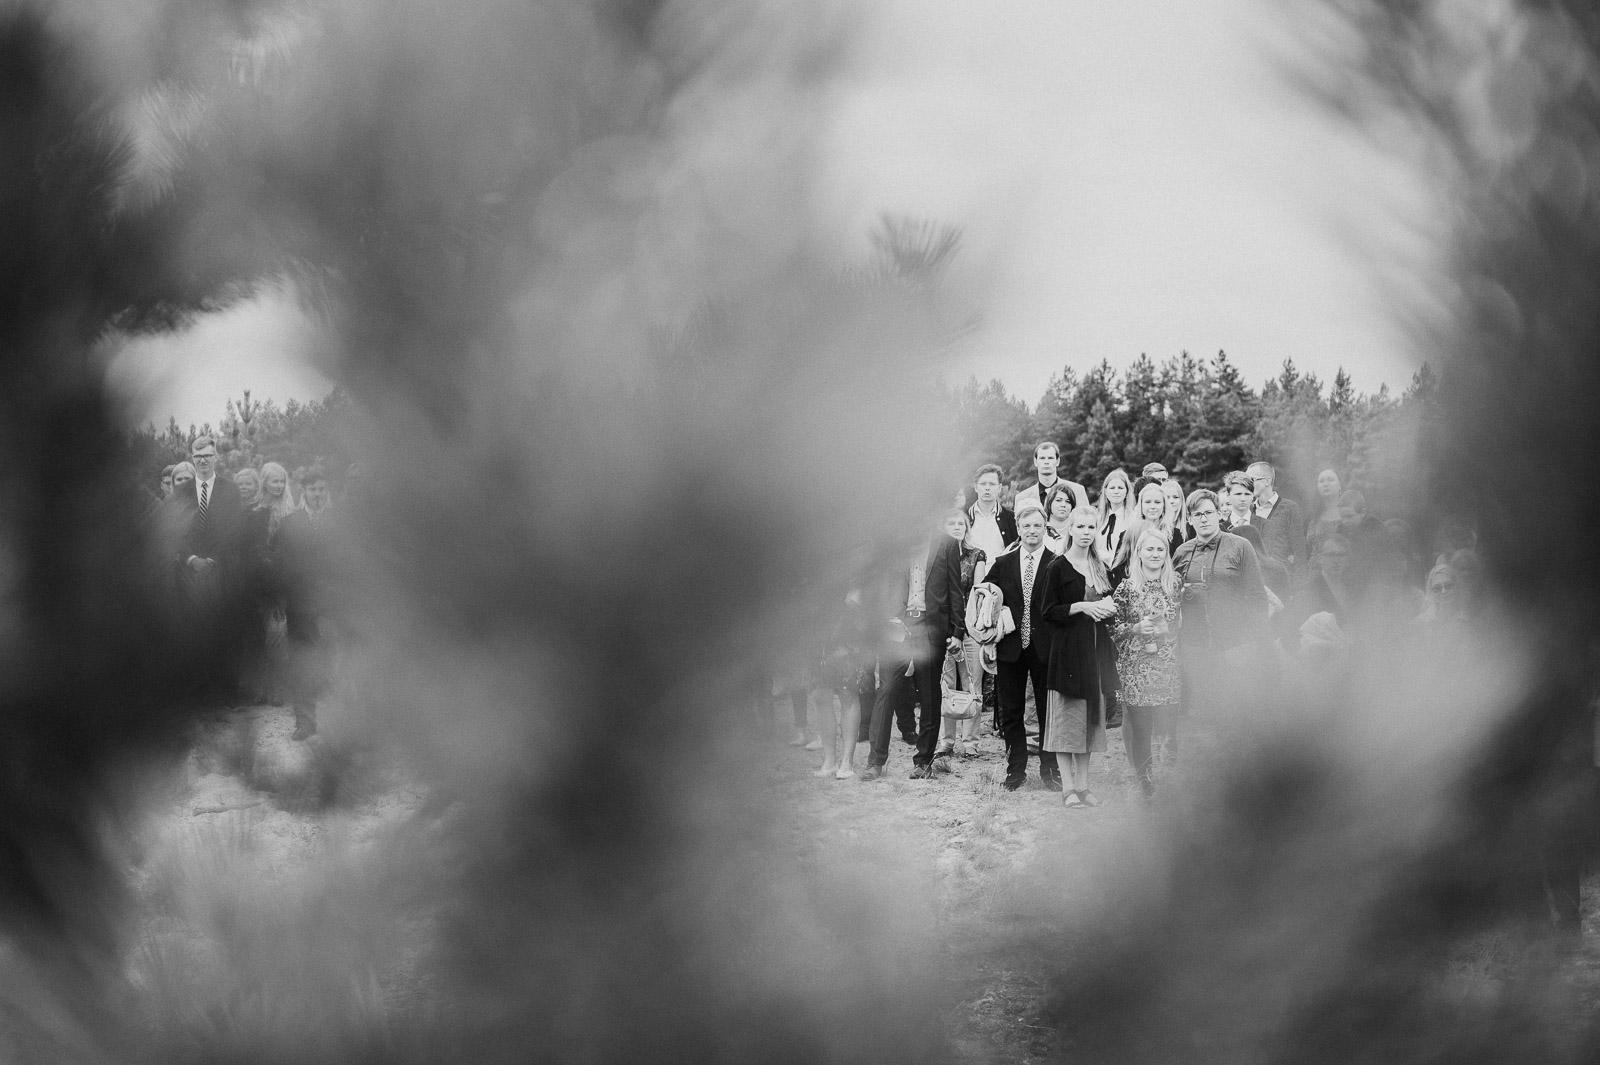 Valdur_Rosenvald_Johanna_pulmafotograaf_Mait_Juriado_M&J_Studios-044